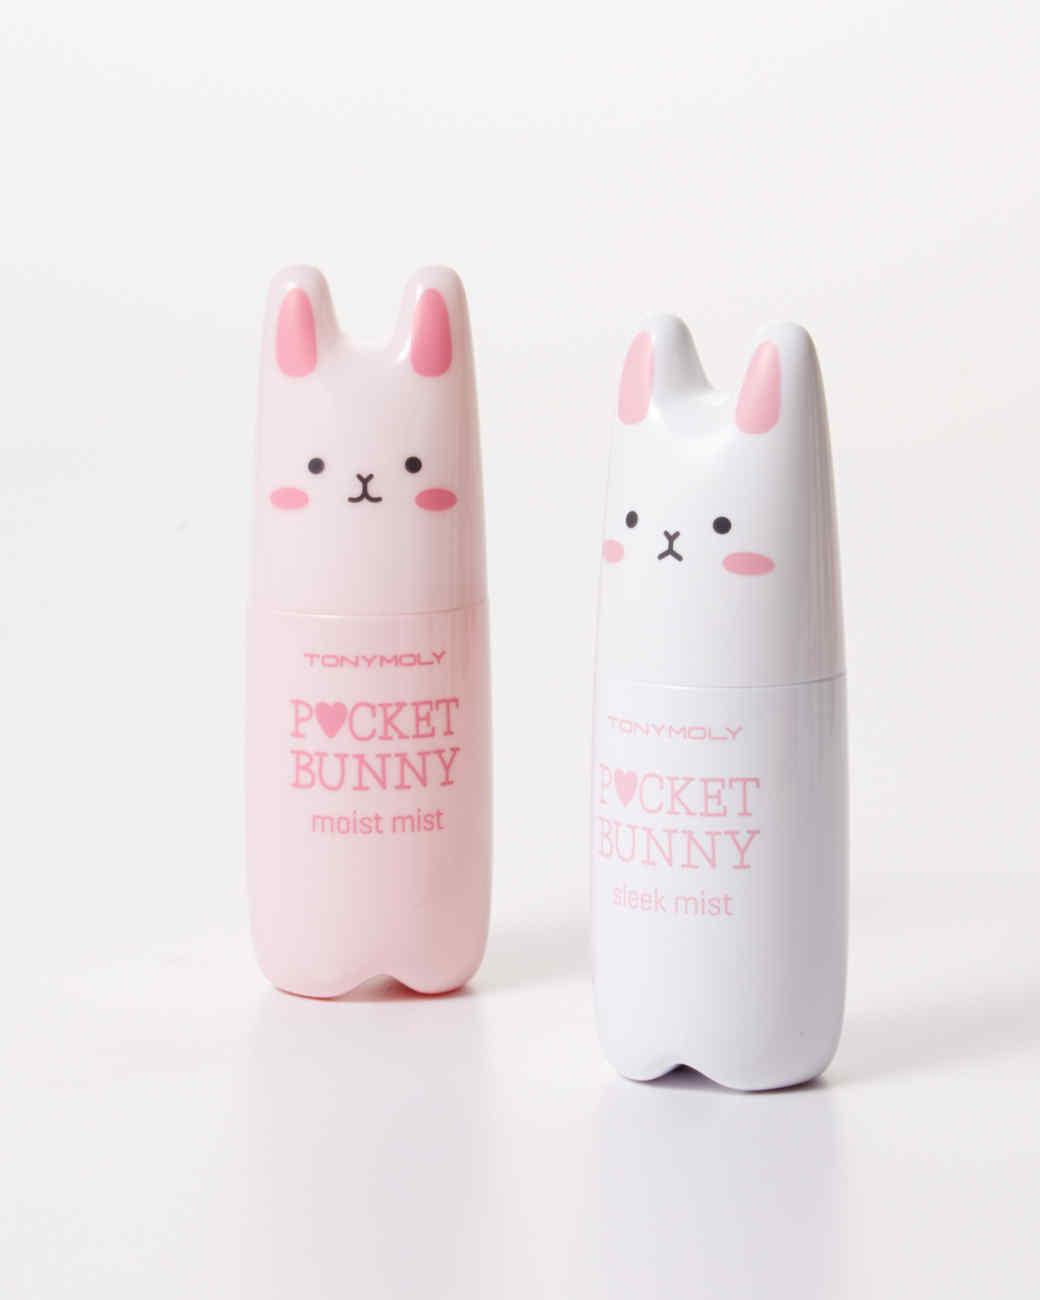 teen-pocket-bunny-mist-2829-d112789-0116.jpg